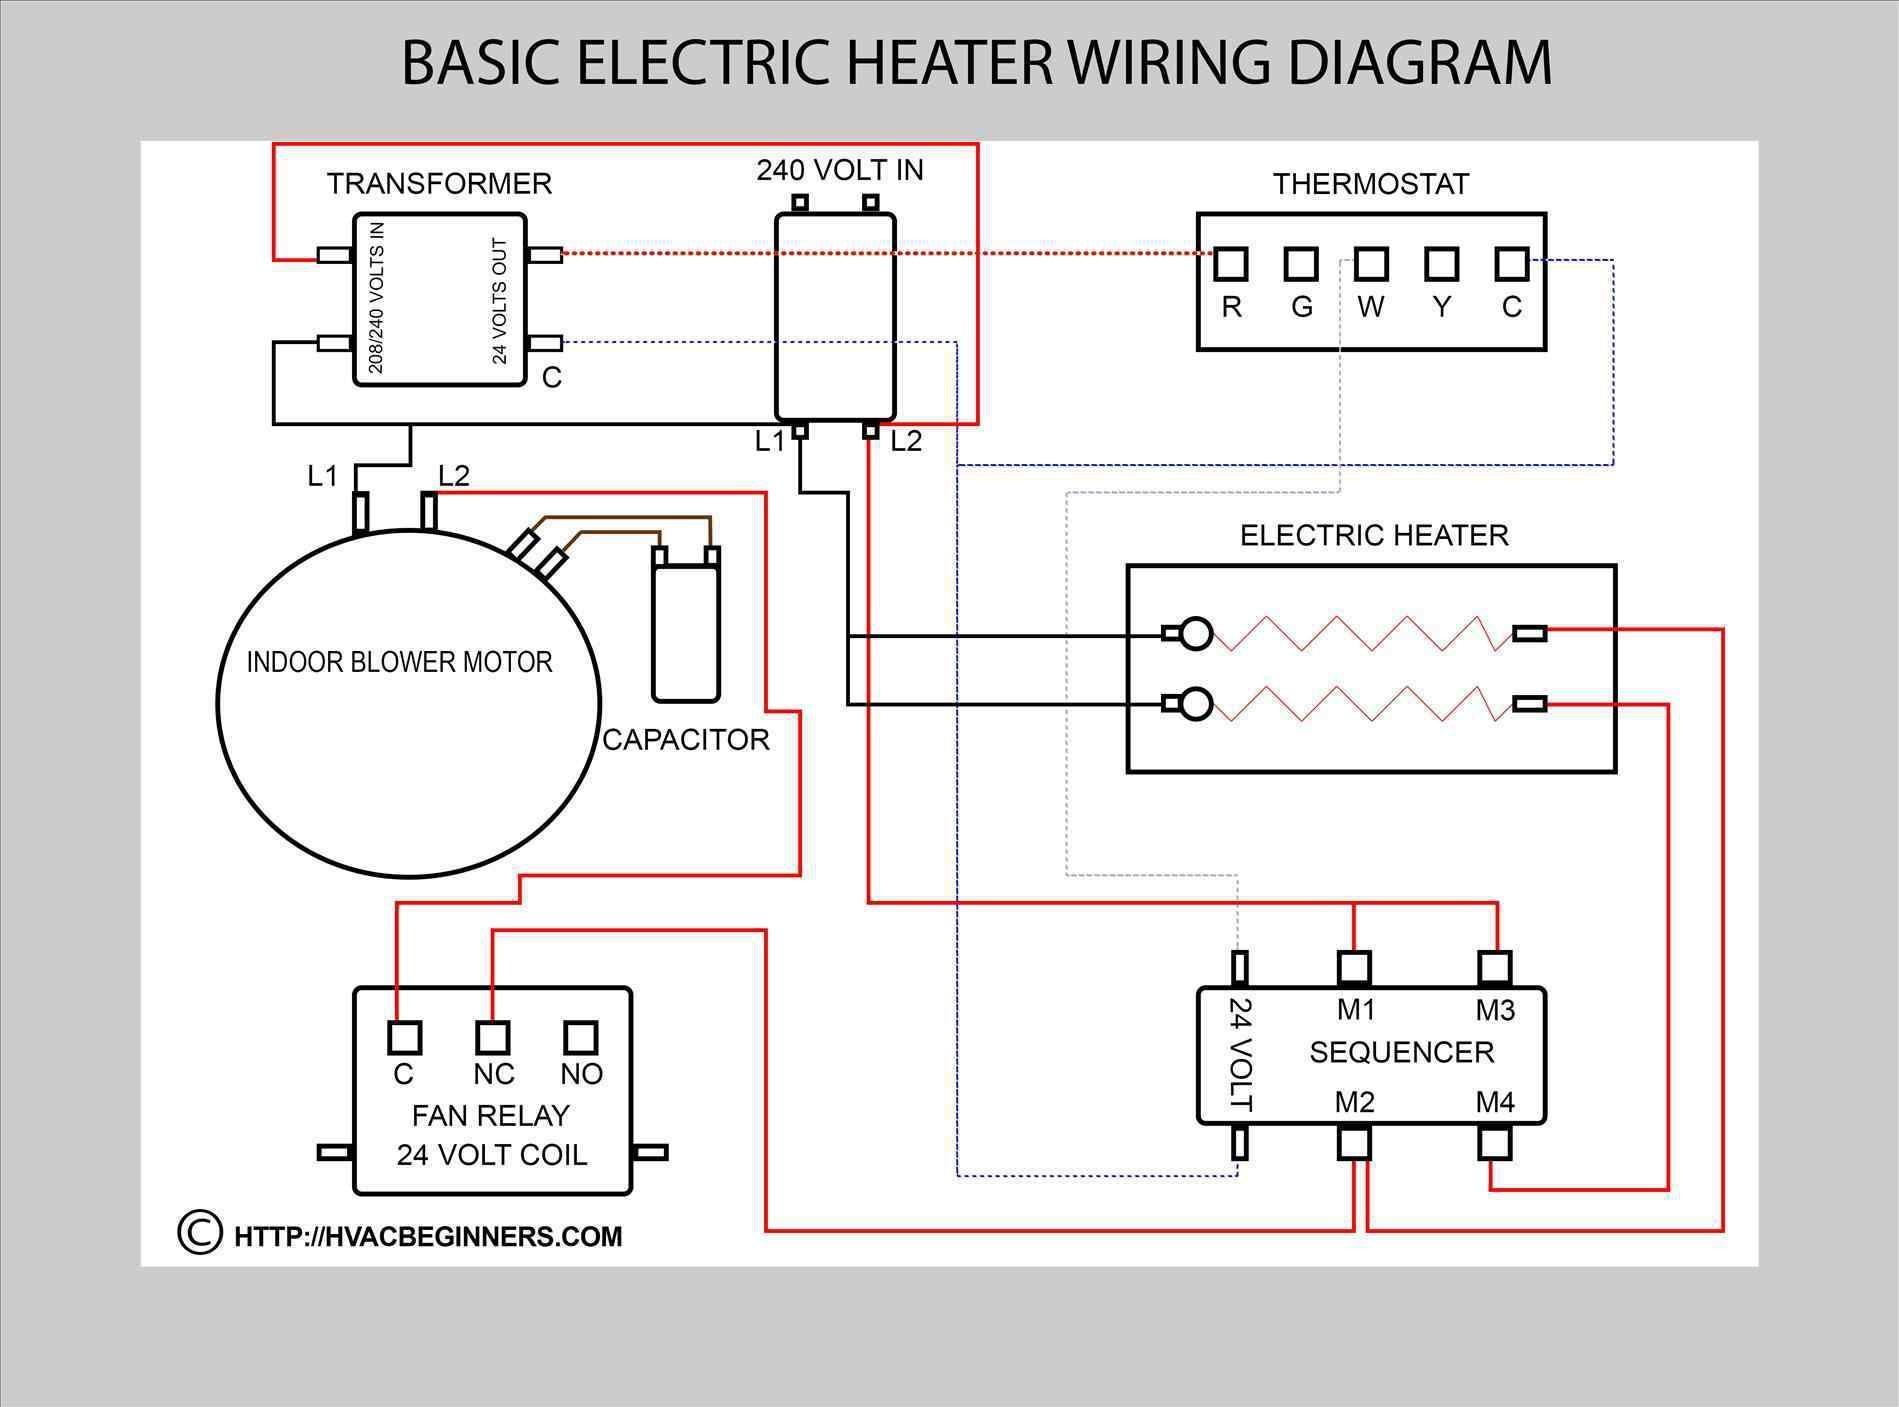 computer wiring diagram pool car fuse box wiring diagram u2022 rh pokerchamps co